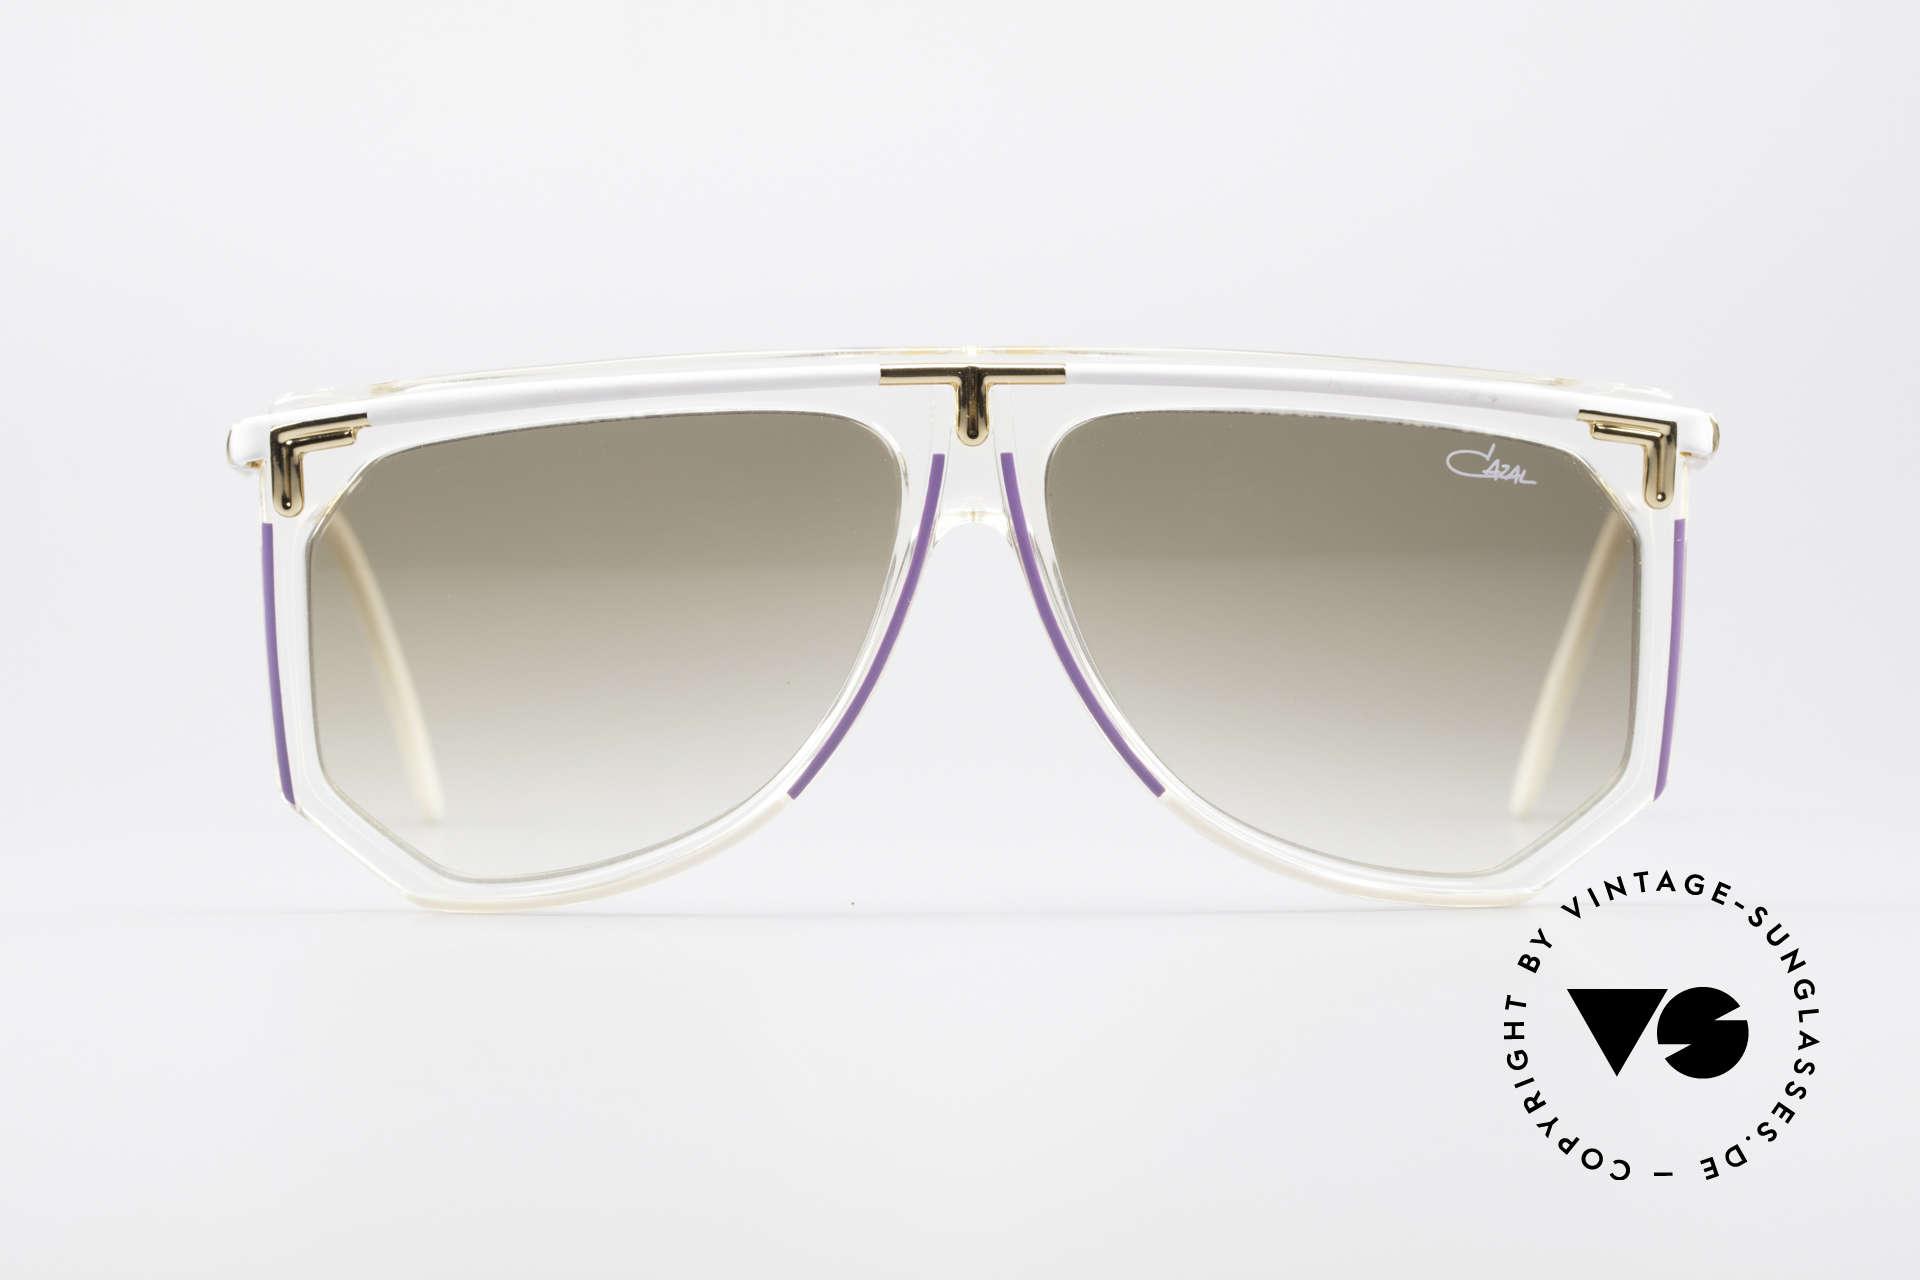 098918f7ec2 Sunglasses Cazal 865 Amerie HipHop 80 s Shades